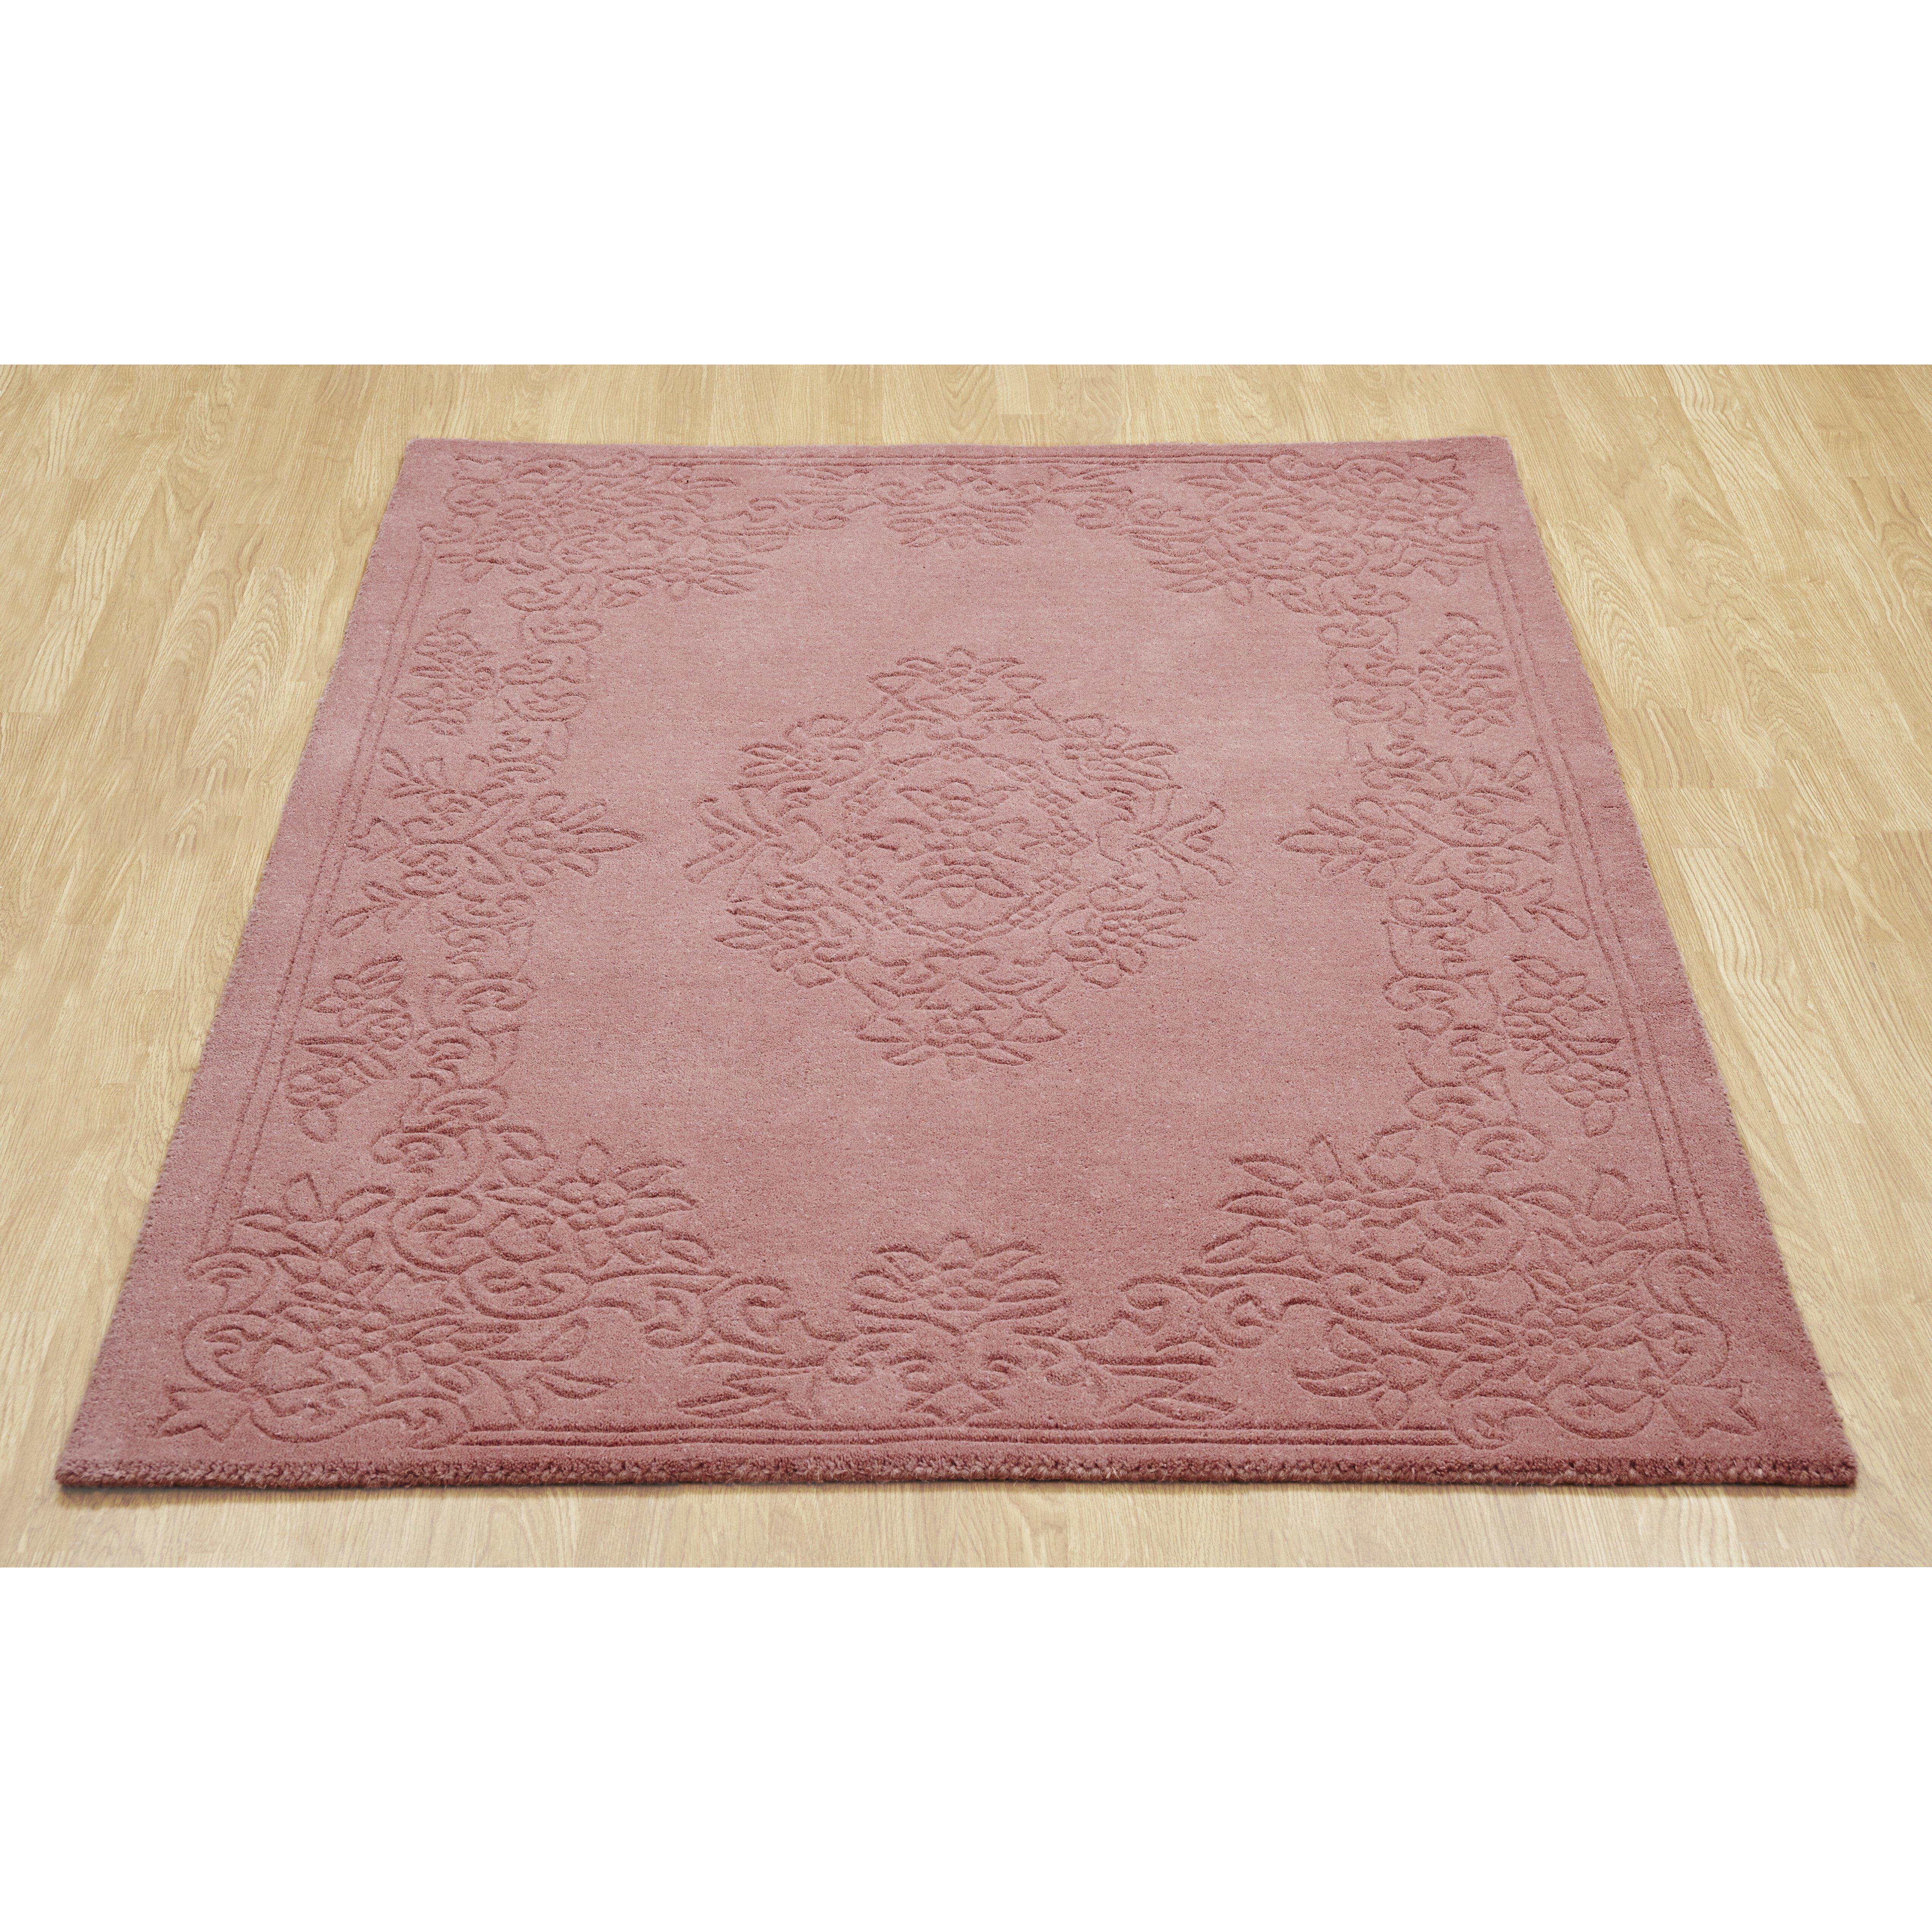 oriental weavers handgewebter teppich imperial in rosa. Black Bedroom Furniture Sets. Home Design Ideas